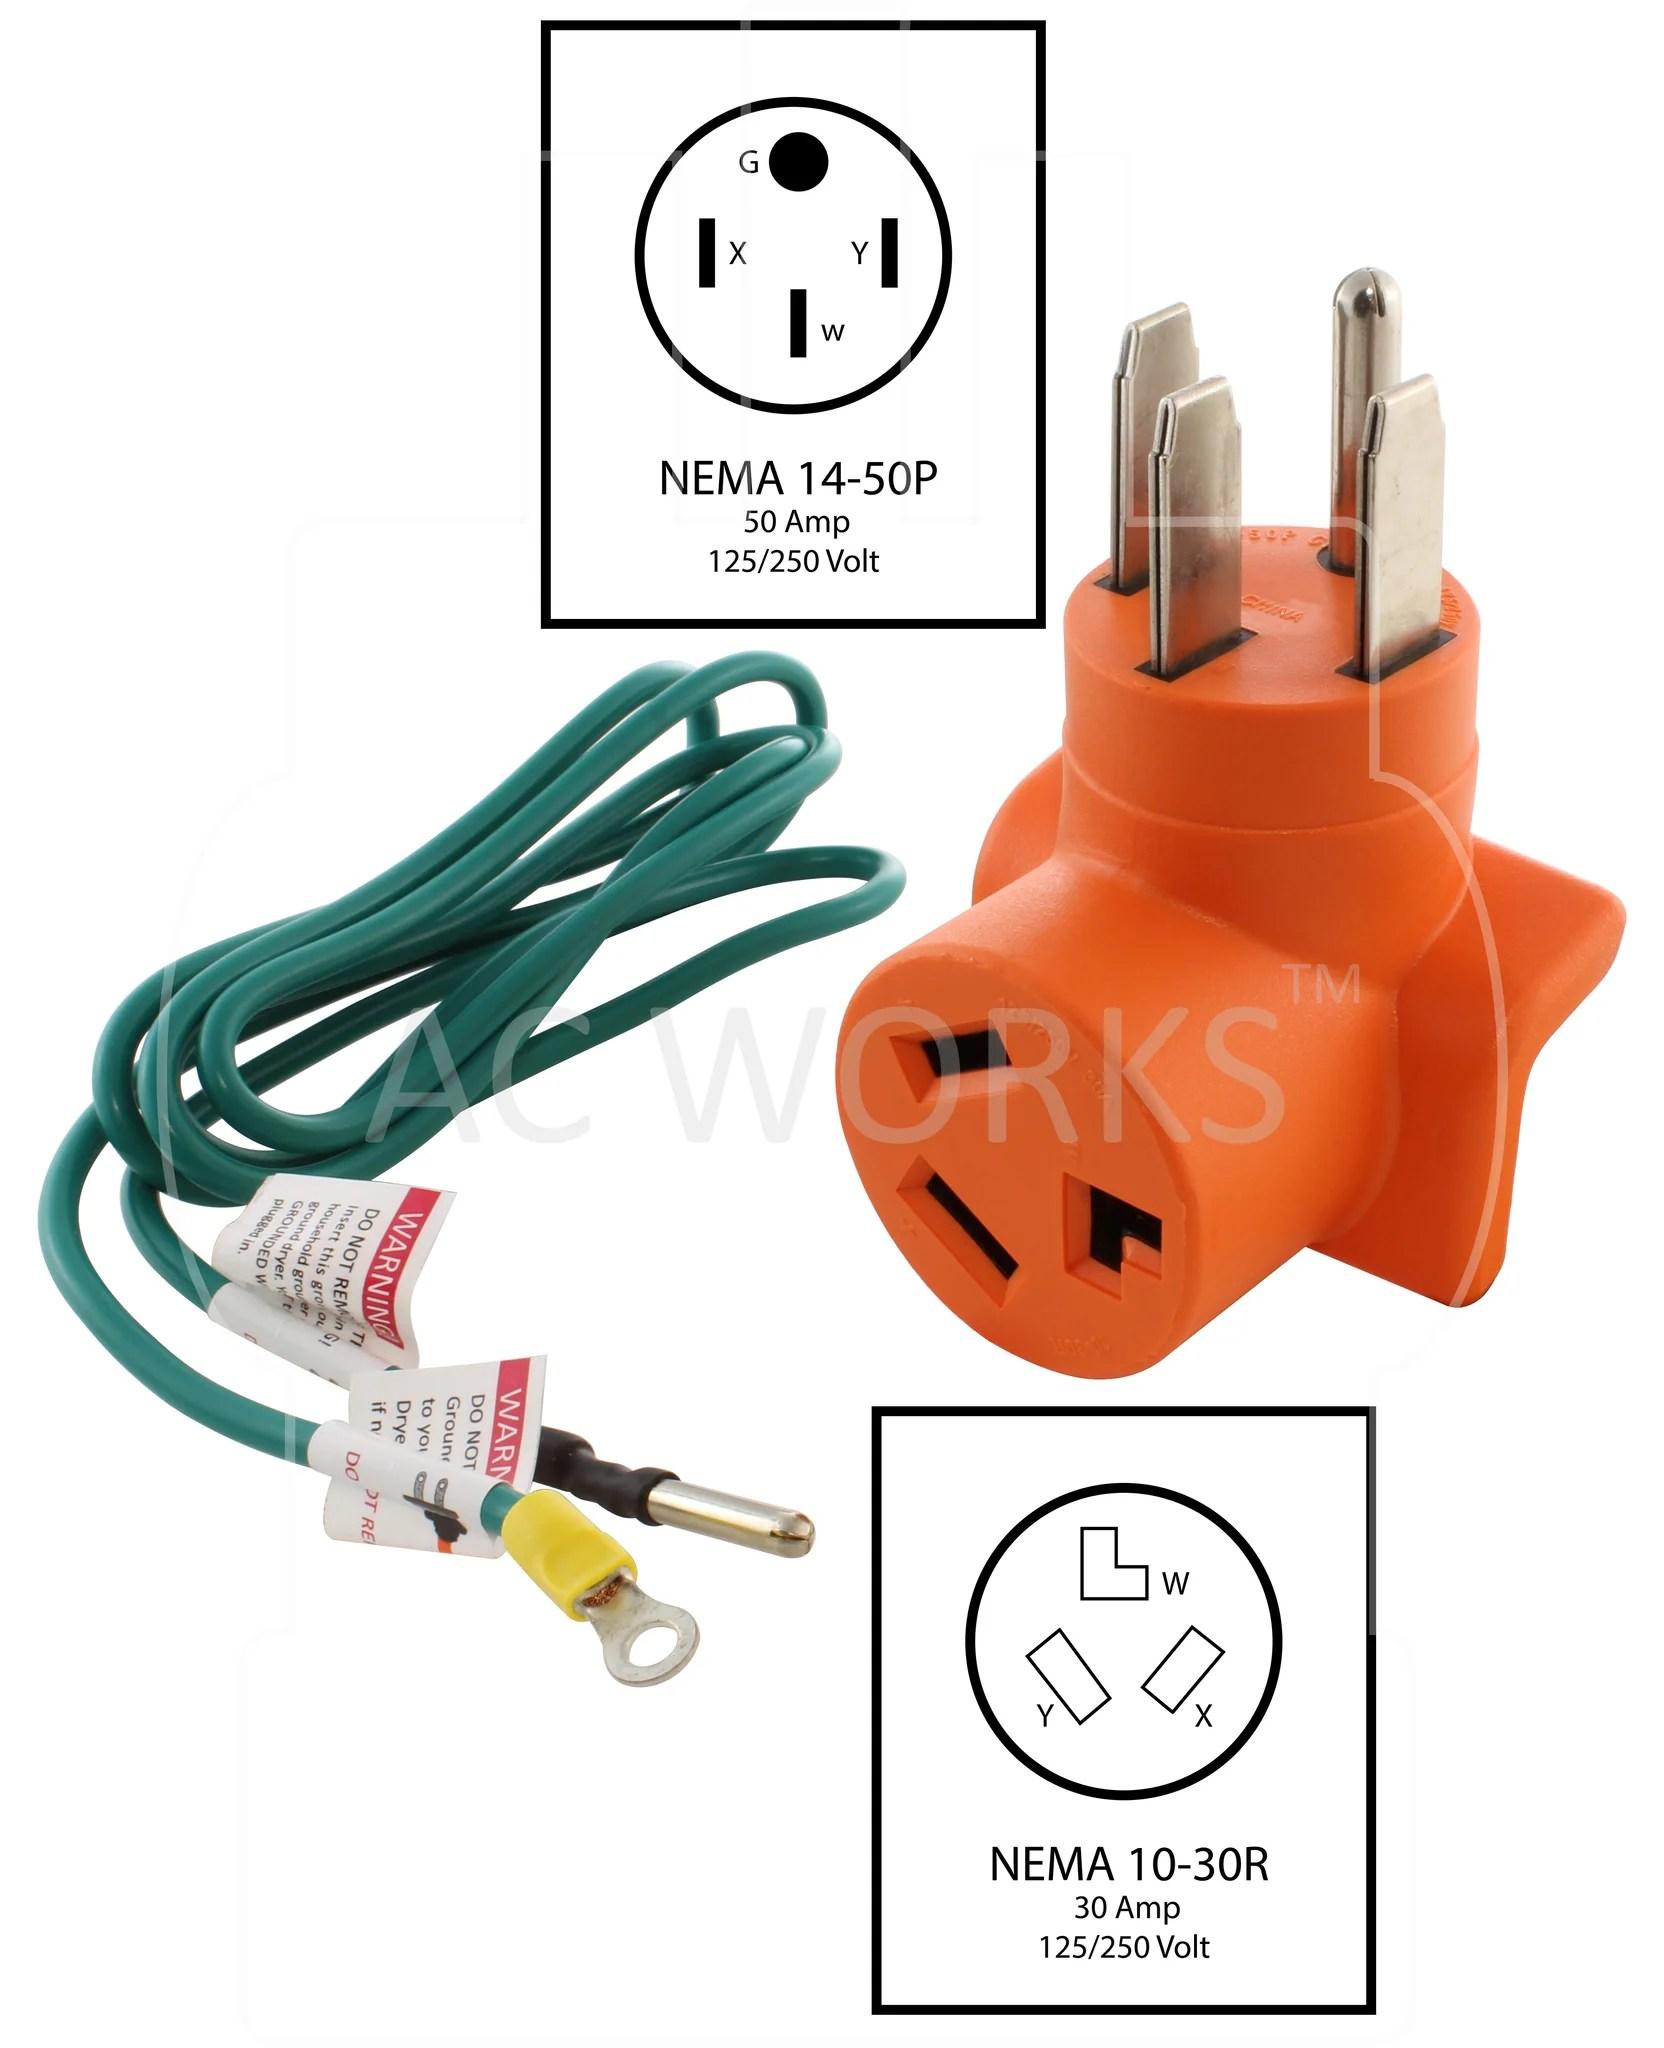 hight resolution of  nema 14 50p to nema 10 30r 1450 to 1030 range outlet